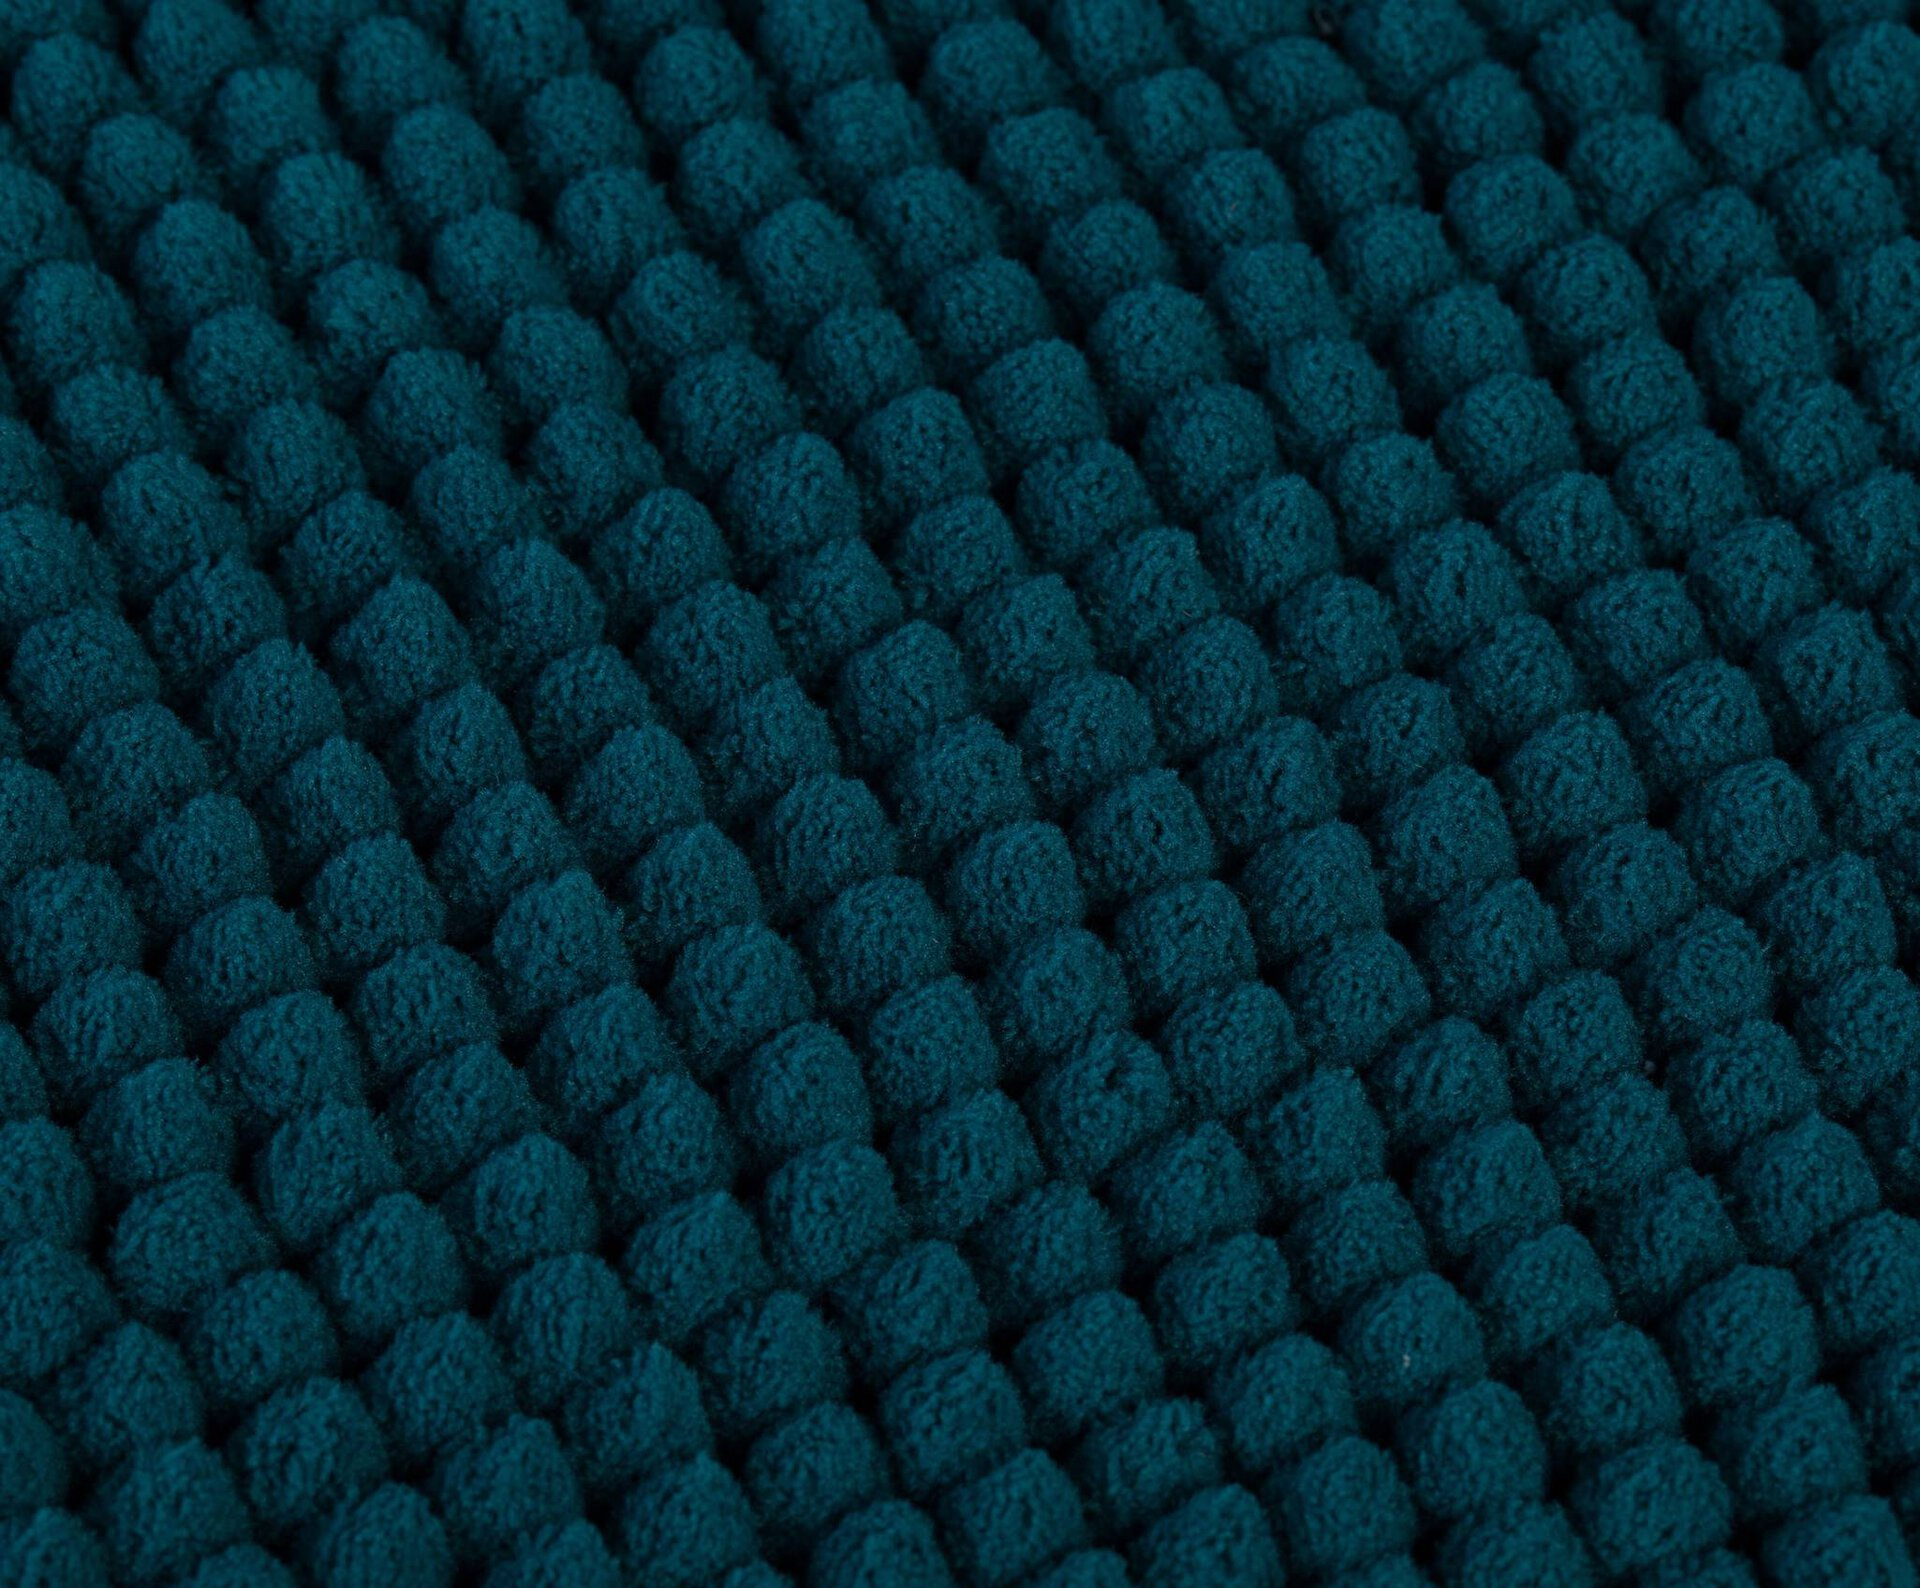 Badteppich Chenille Ambiente Trendlife Textil Blau 50 x 70 cm